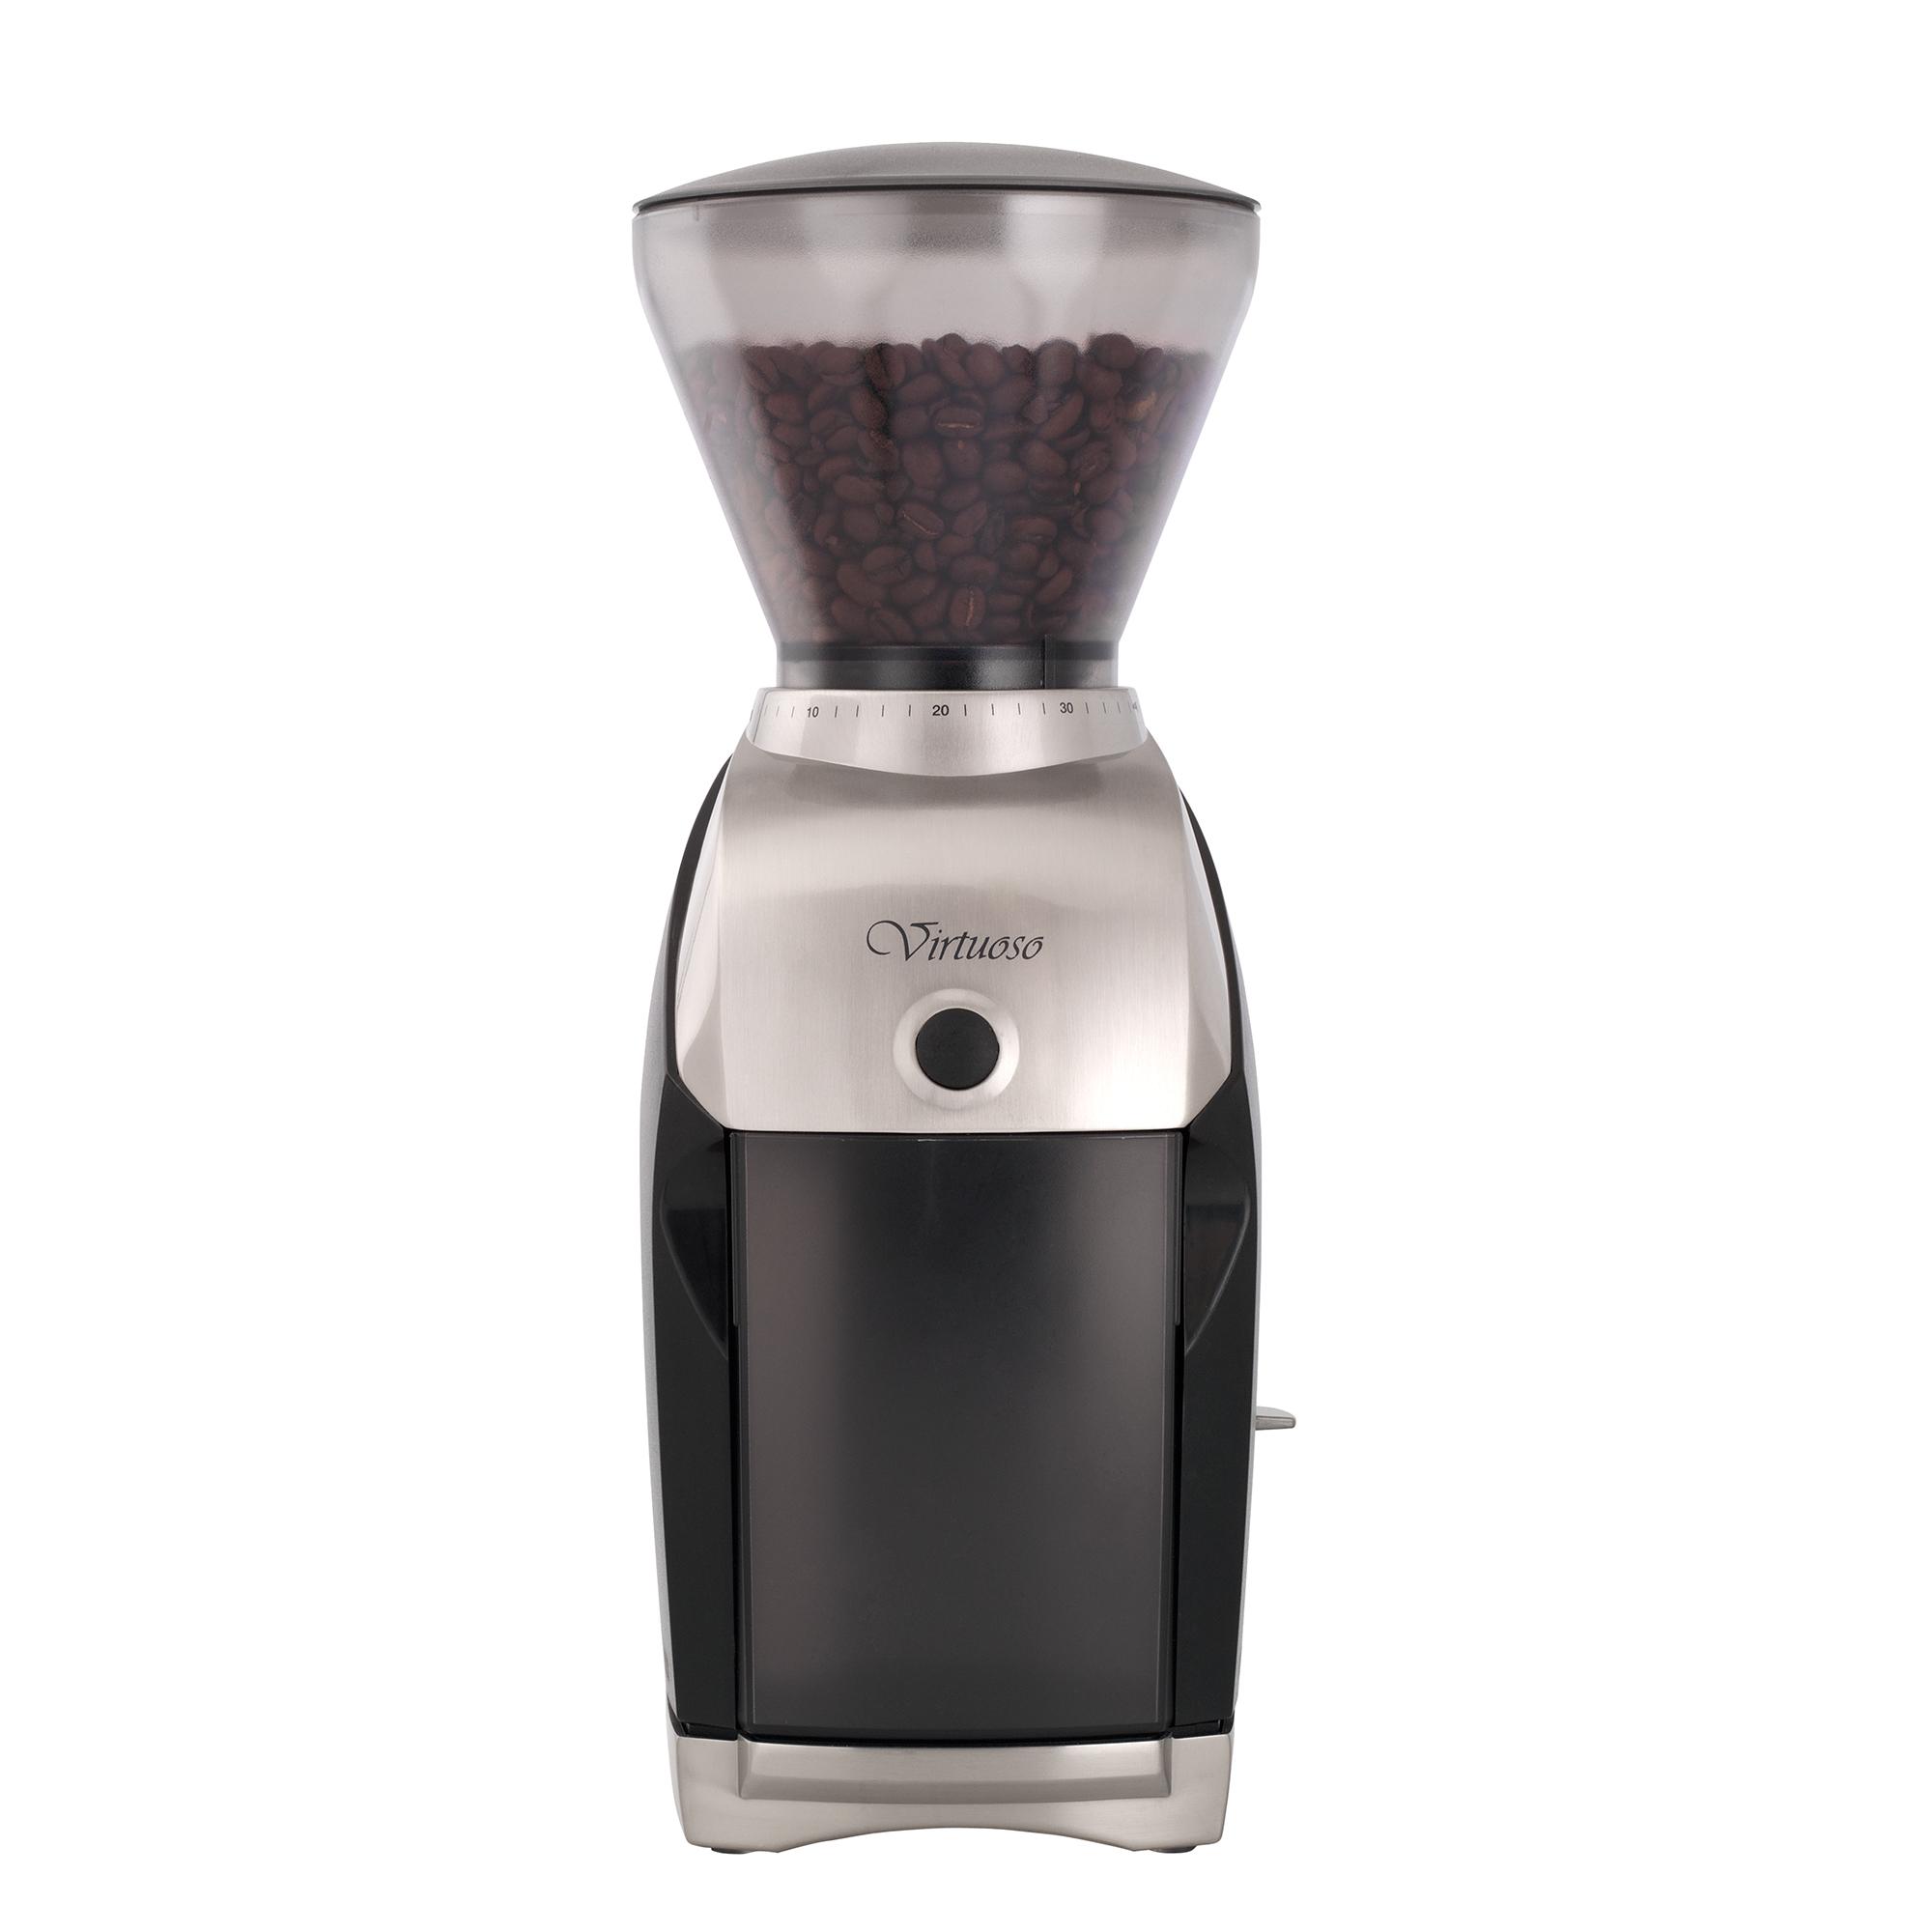 Baratza Virtuoso Conical Burr Coffee Grinder AC $183.20 + Free Shipping